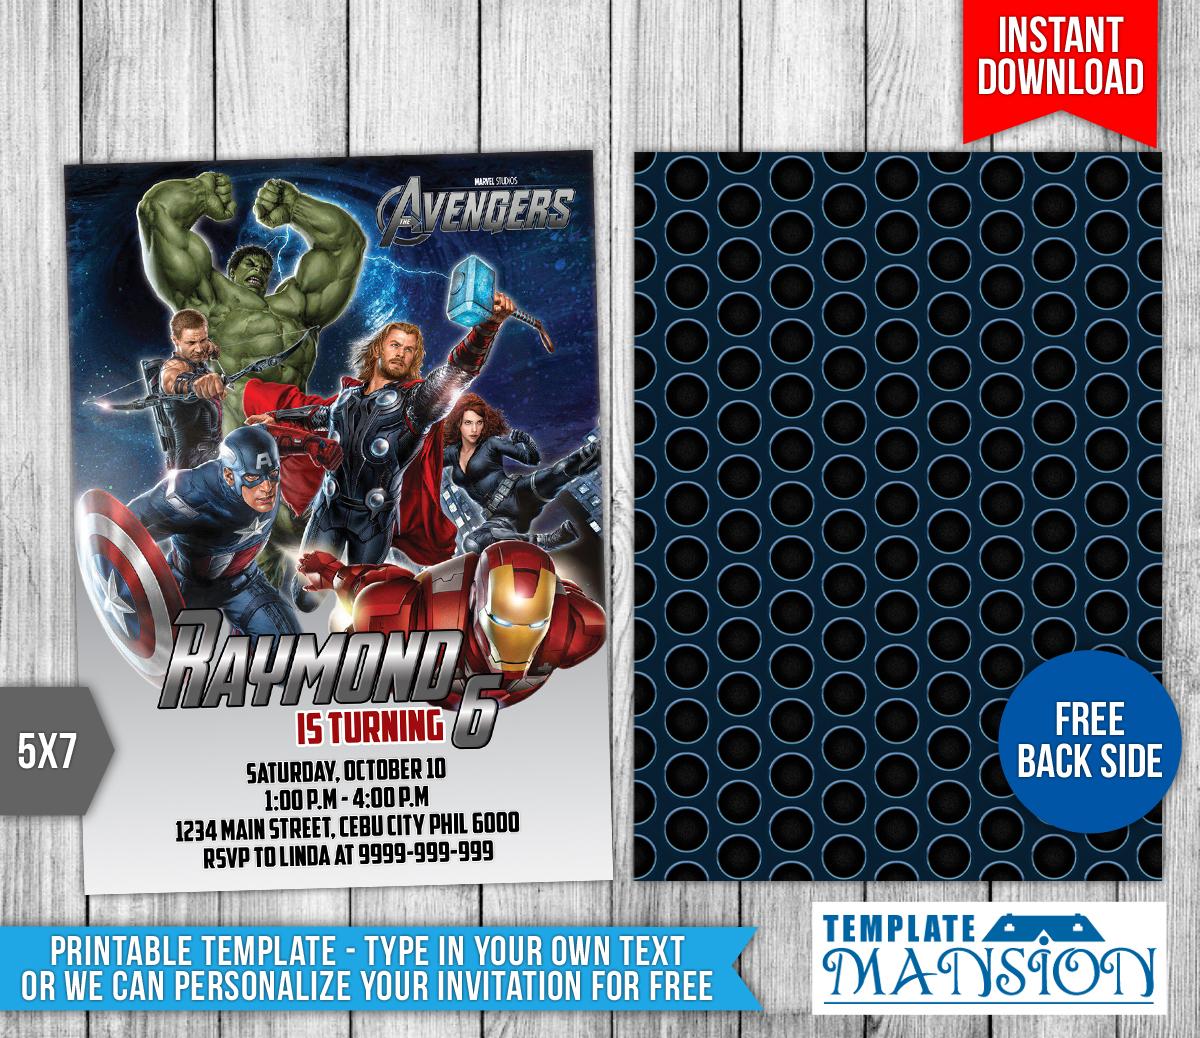 avengers birthday invitation  2 by templatemansion on